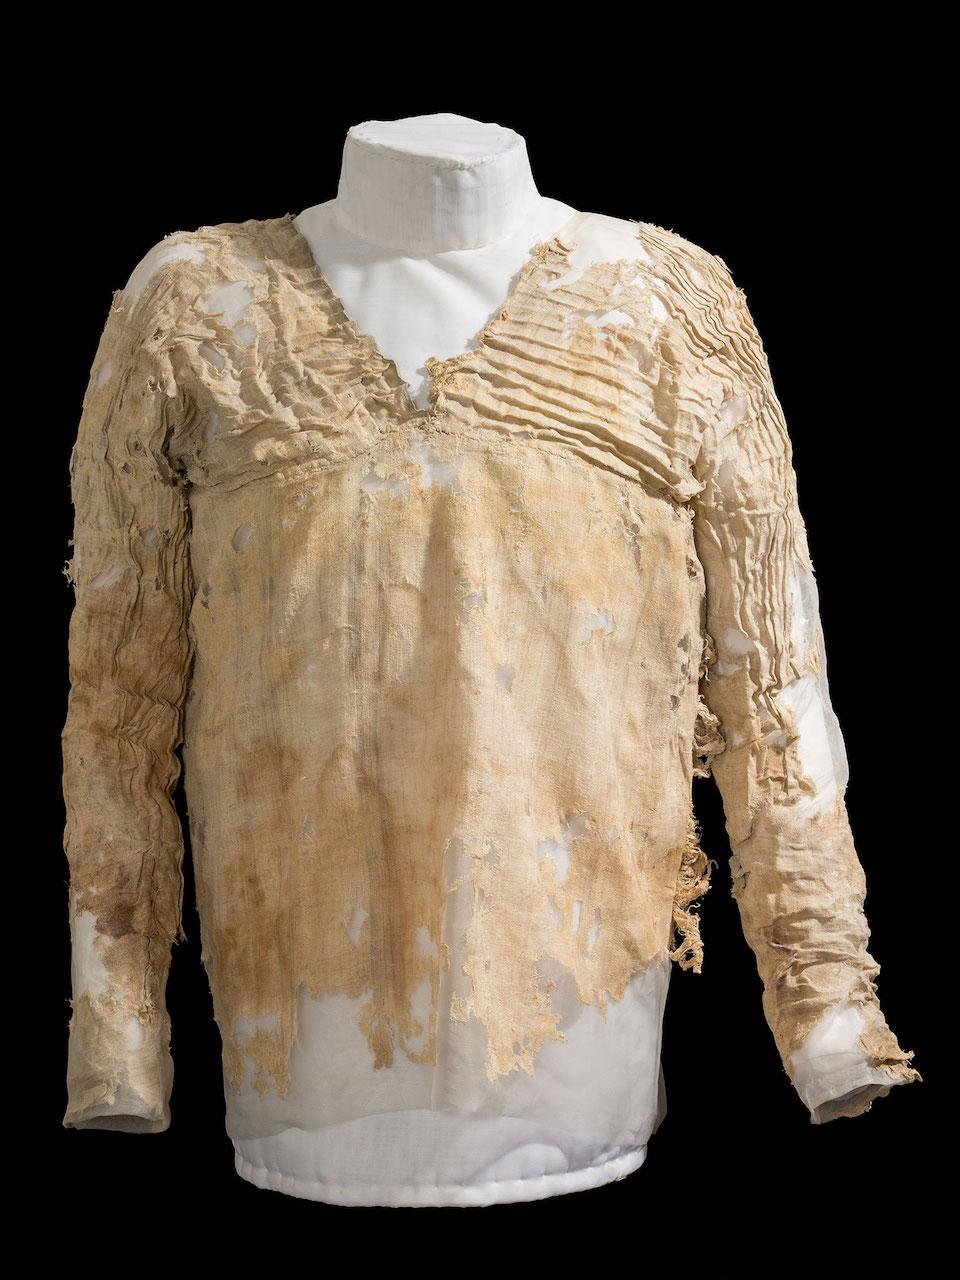 The Tarkhan Dress (courtesy Petrie Museum/UCL)